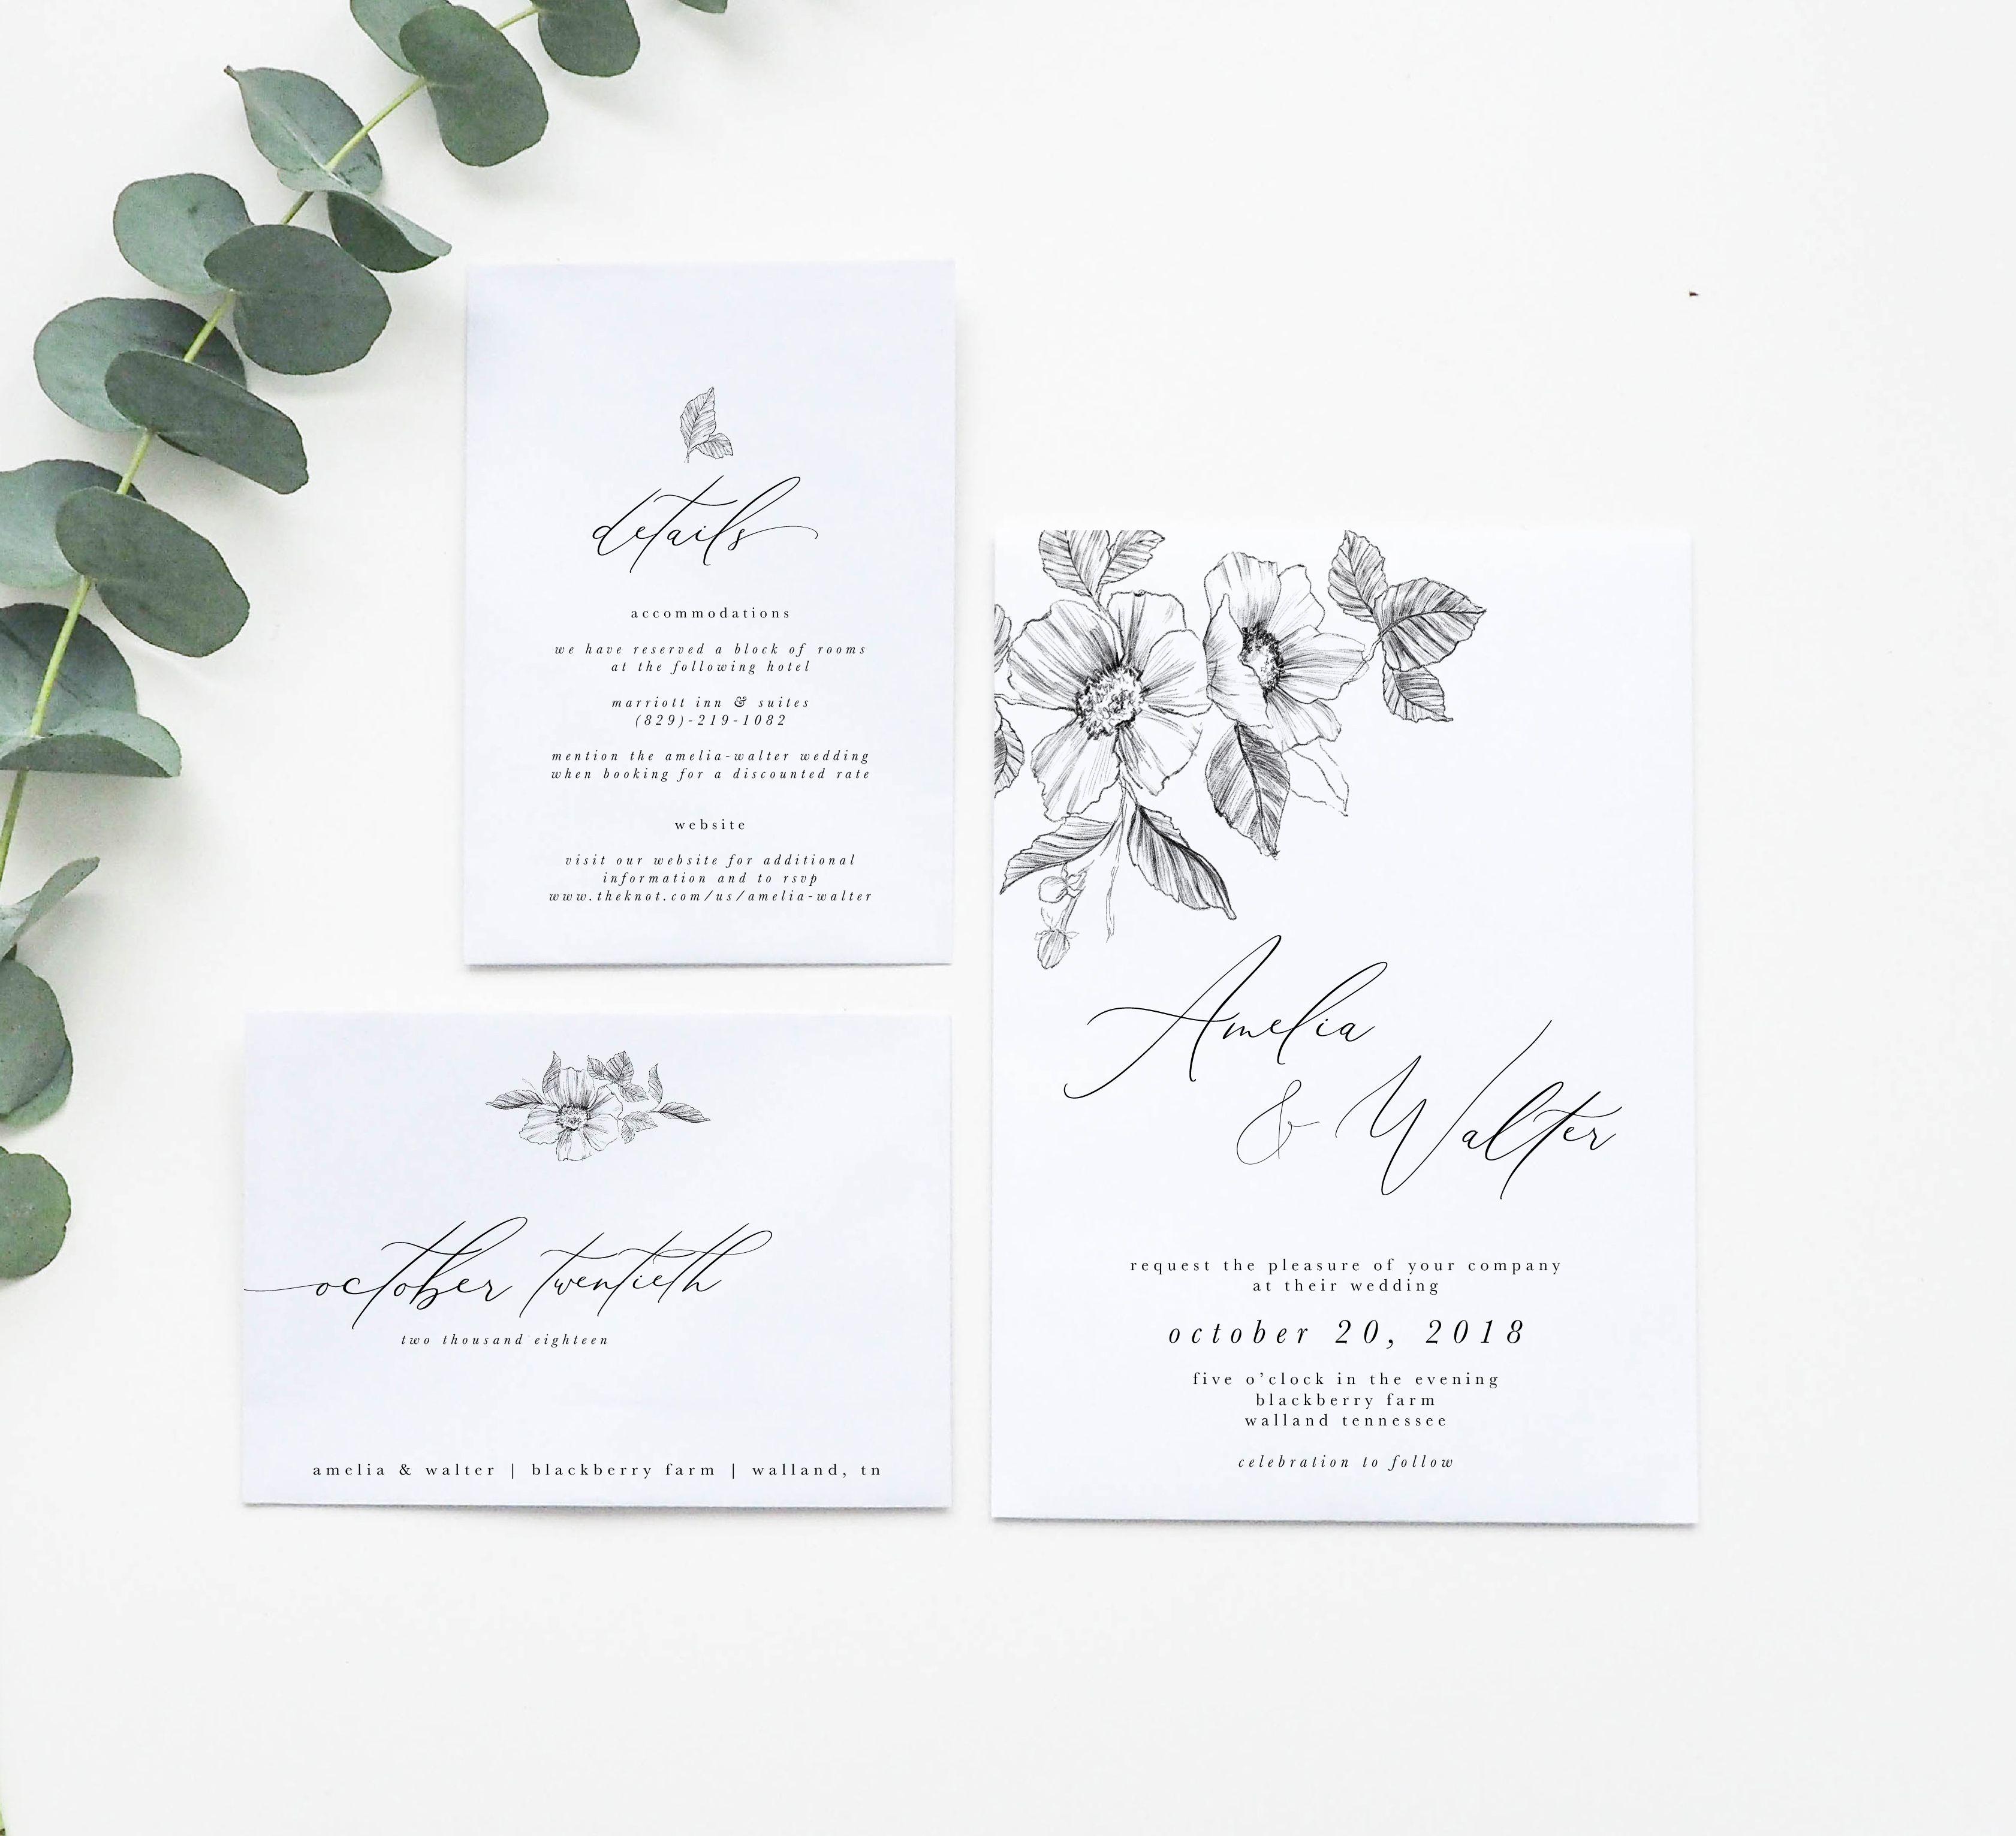 Simple Wedding Invitation Floral Wedding Invitation Floral Wedding Invitations Simple Wedding Invitations Minimal Wedding Invitation